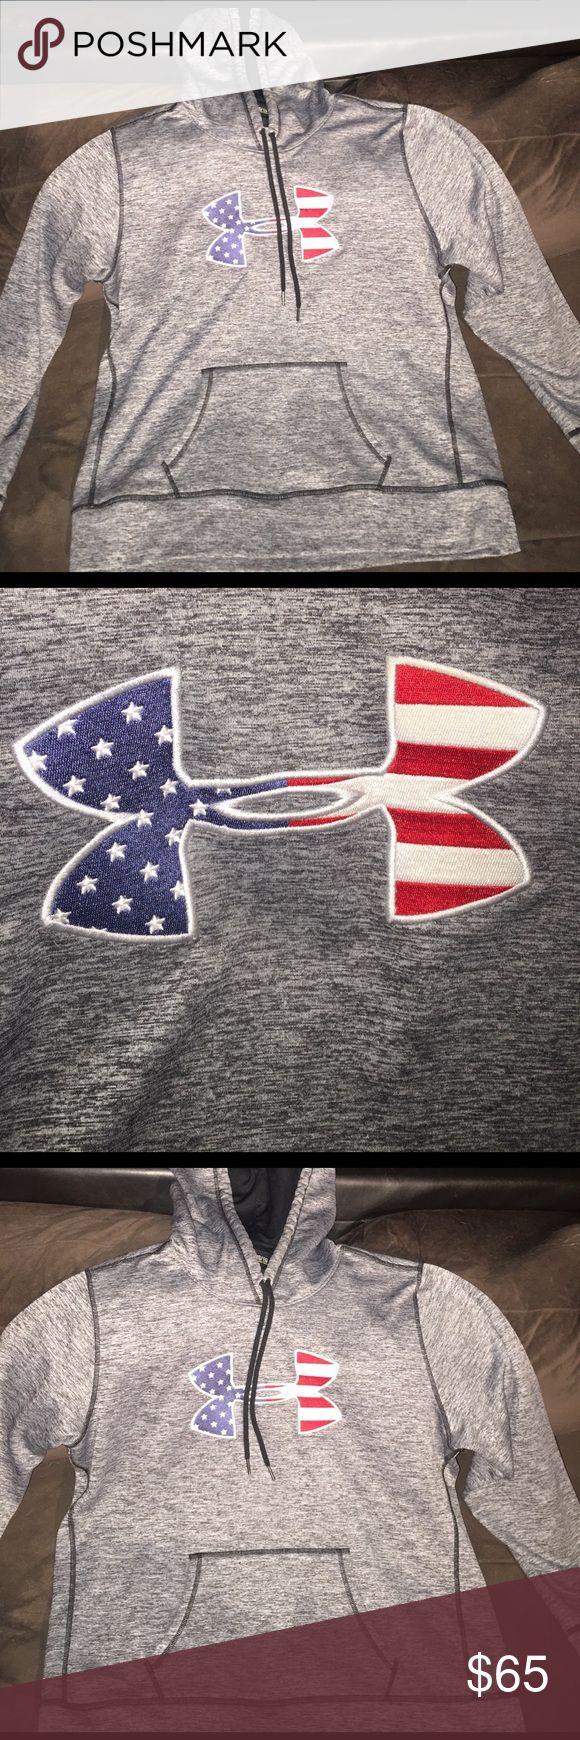 Woman's Under Armour Sweatshirt American Flag Logo Under Armour Gray  Red White & Blue American Flag Logo Sweatshirt. Brand New worn inside 2 times Under Armour Tops Sweatshirts & Hoodies